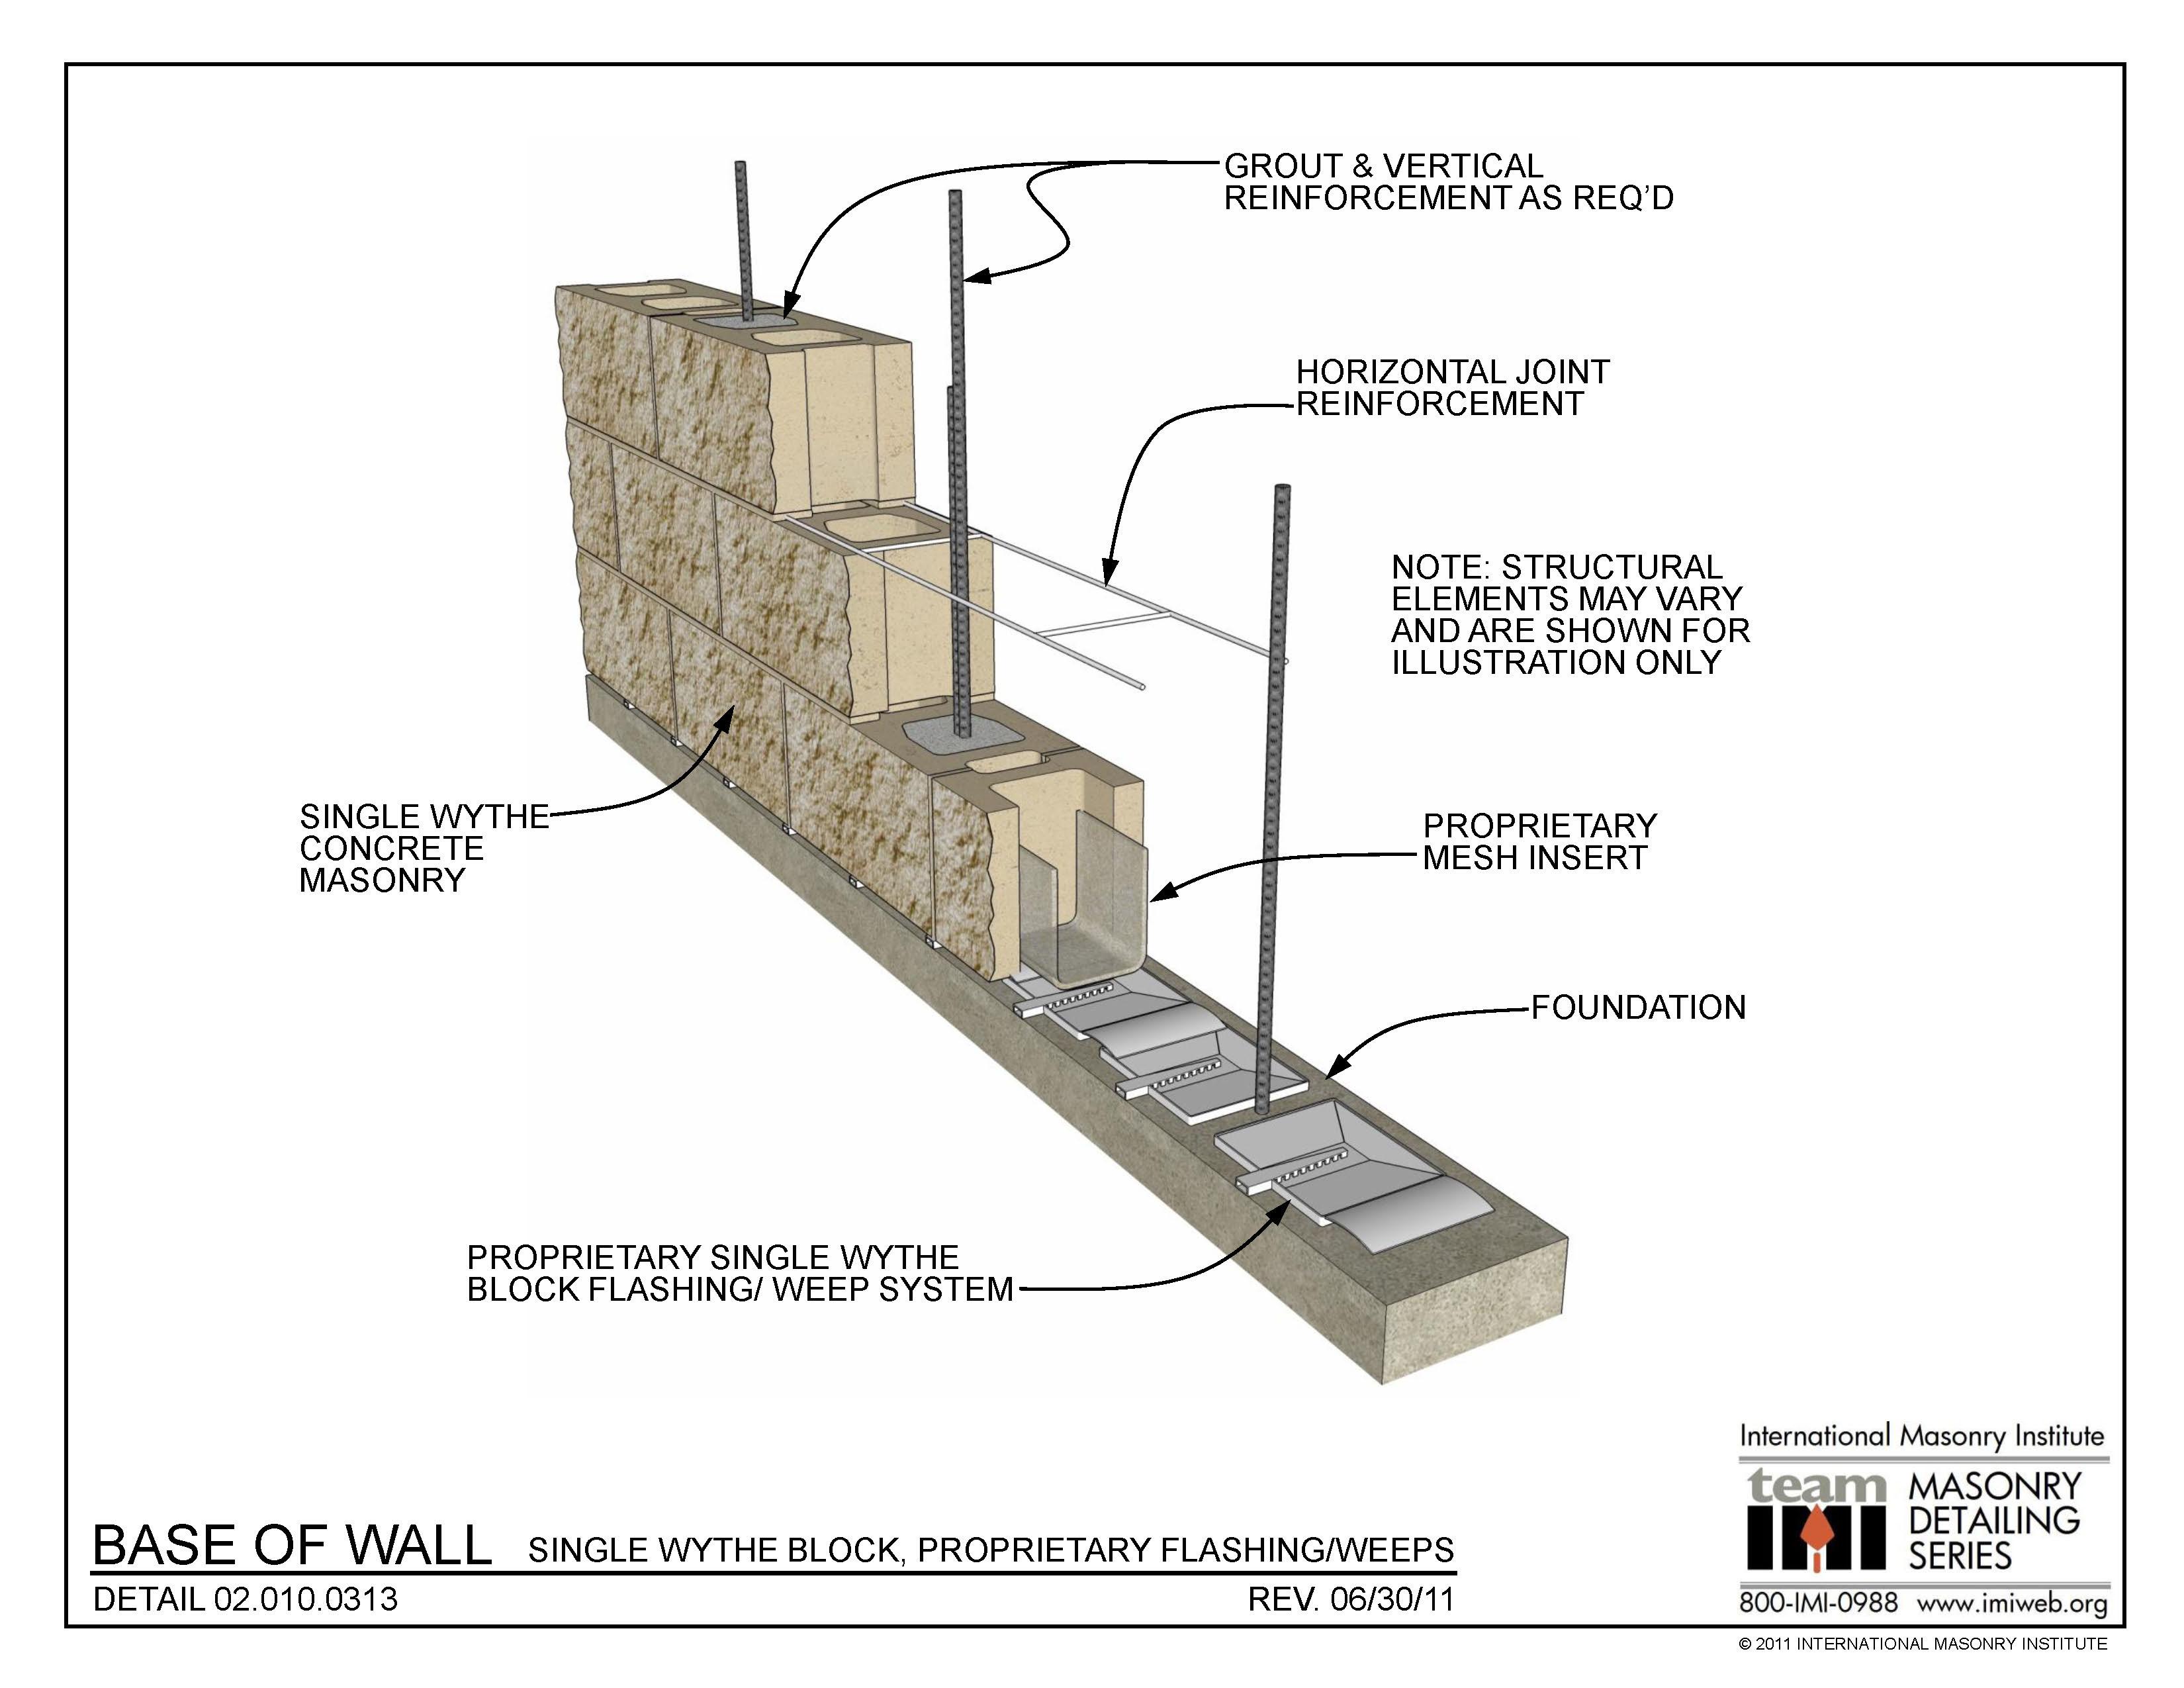 02 010 0313 Base Of Wall Single Wythe Block